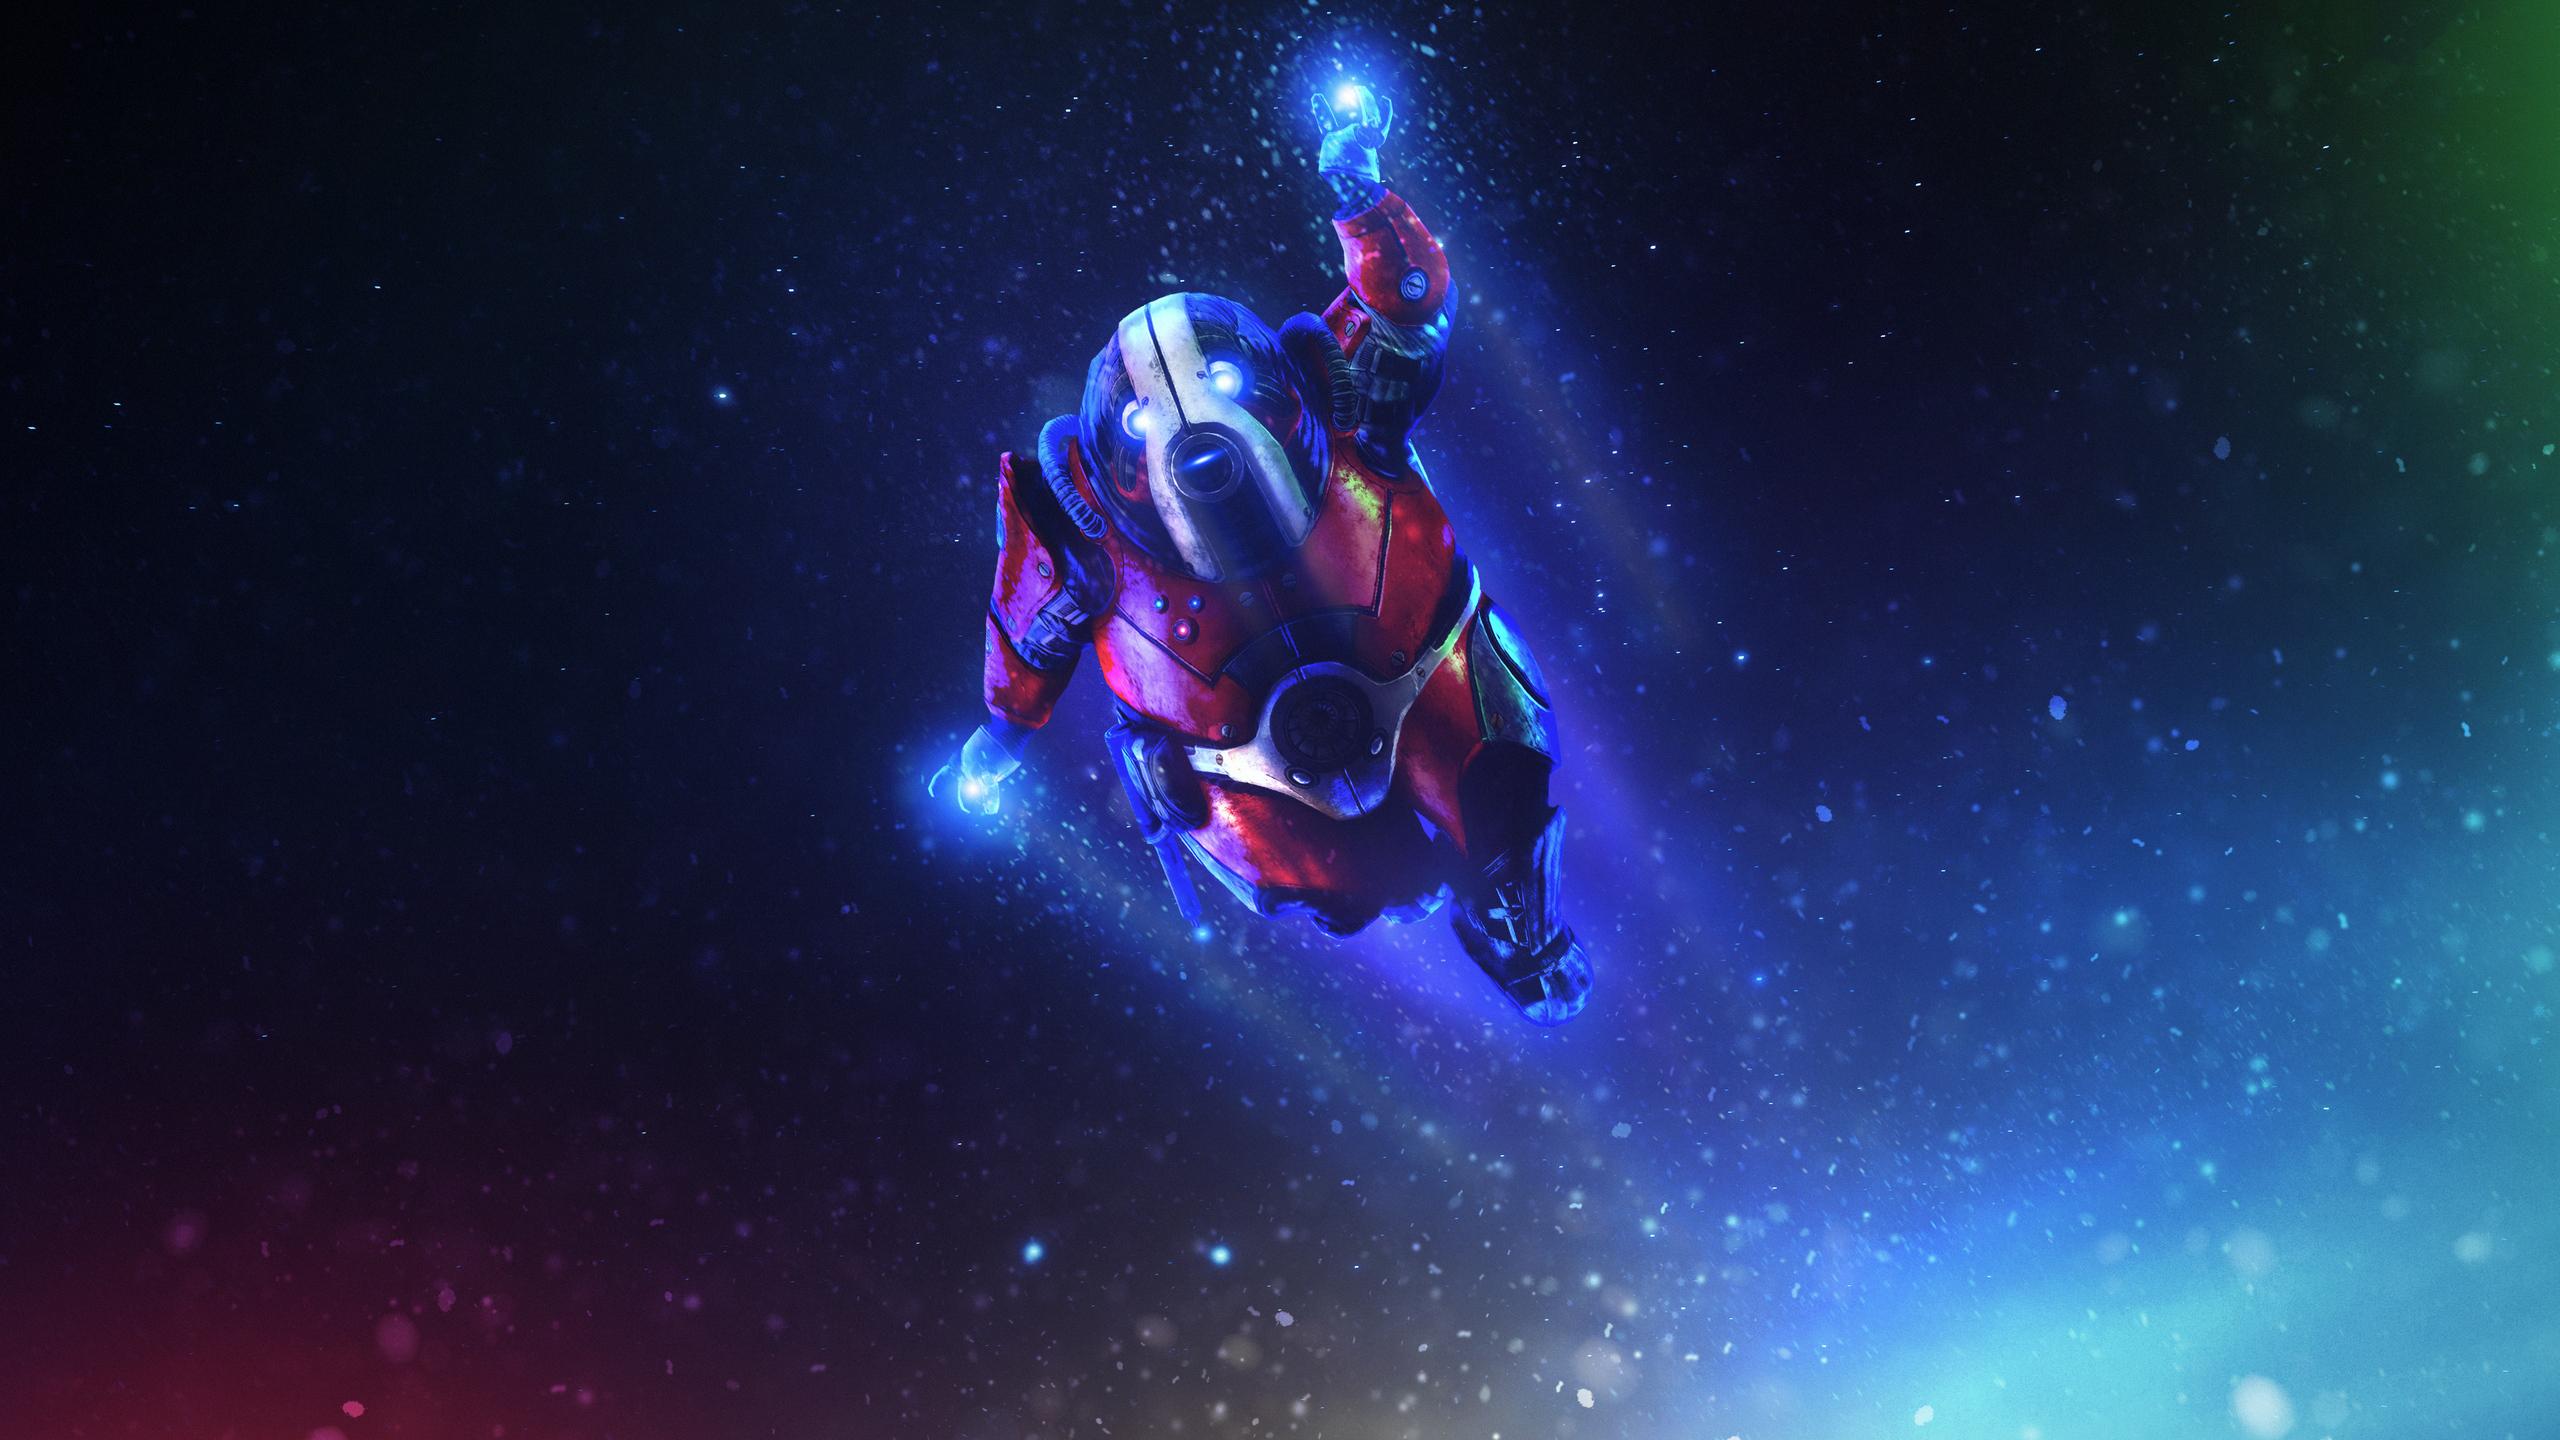 2560x1440 Biotic Winter Mass Effect Andromeda 4k 1440p Resolution